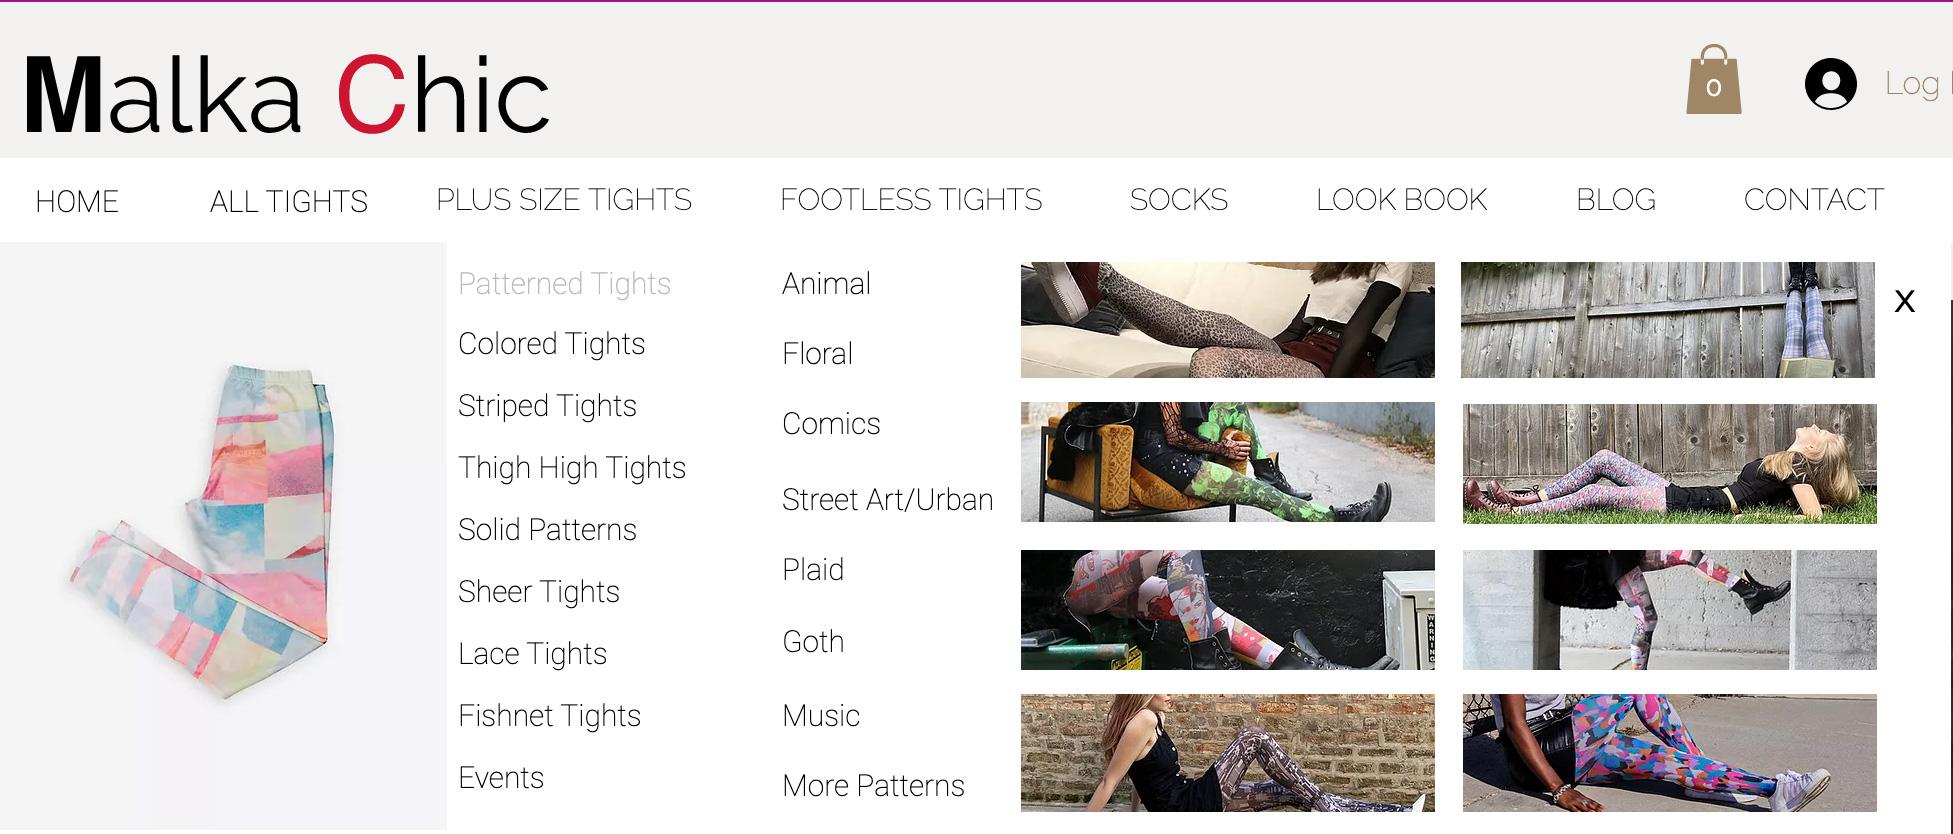 Malka Chic Website by Adchix